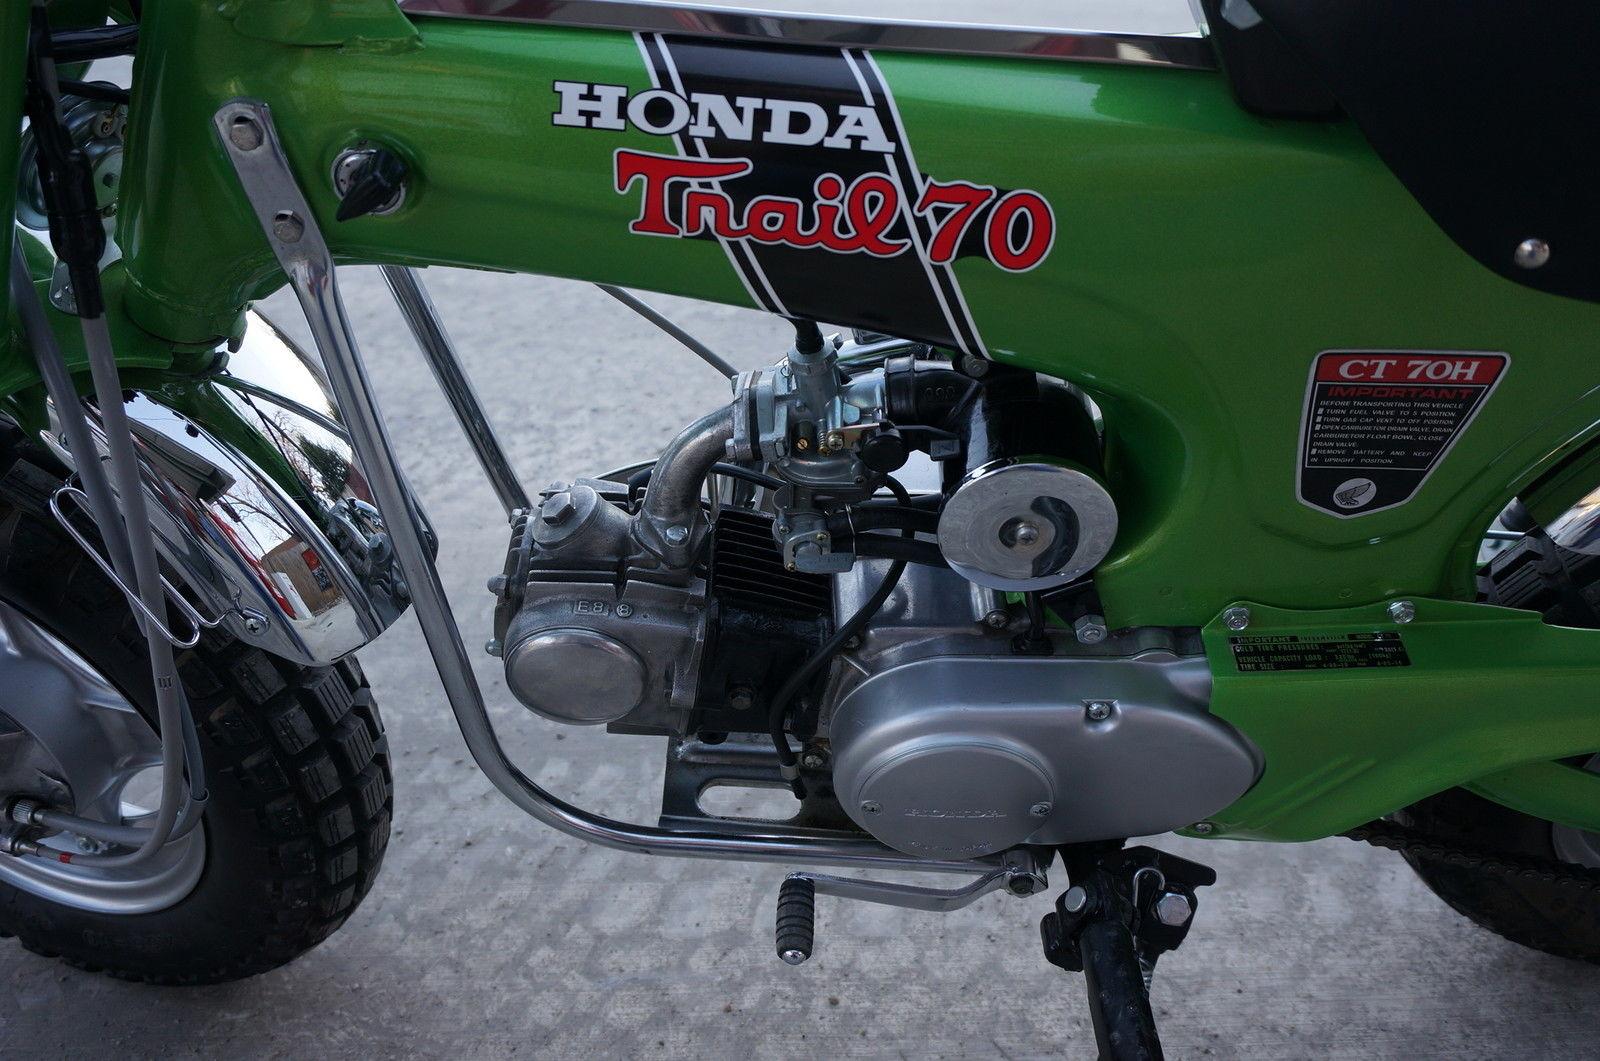 Honda Ct Mini Trail Speed Restored on Honda Trail 70 Ebay